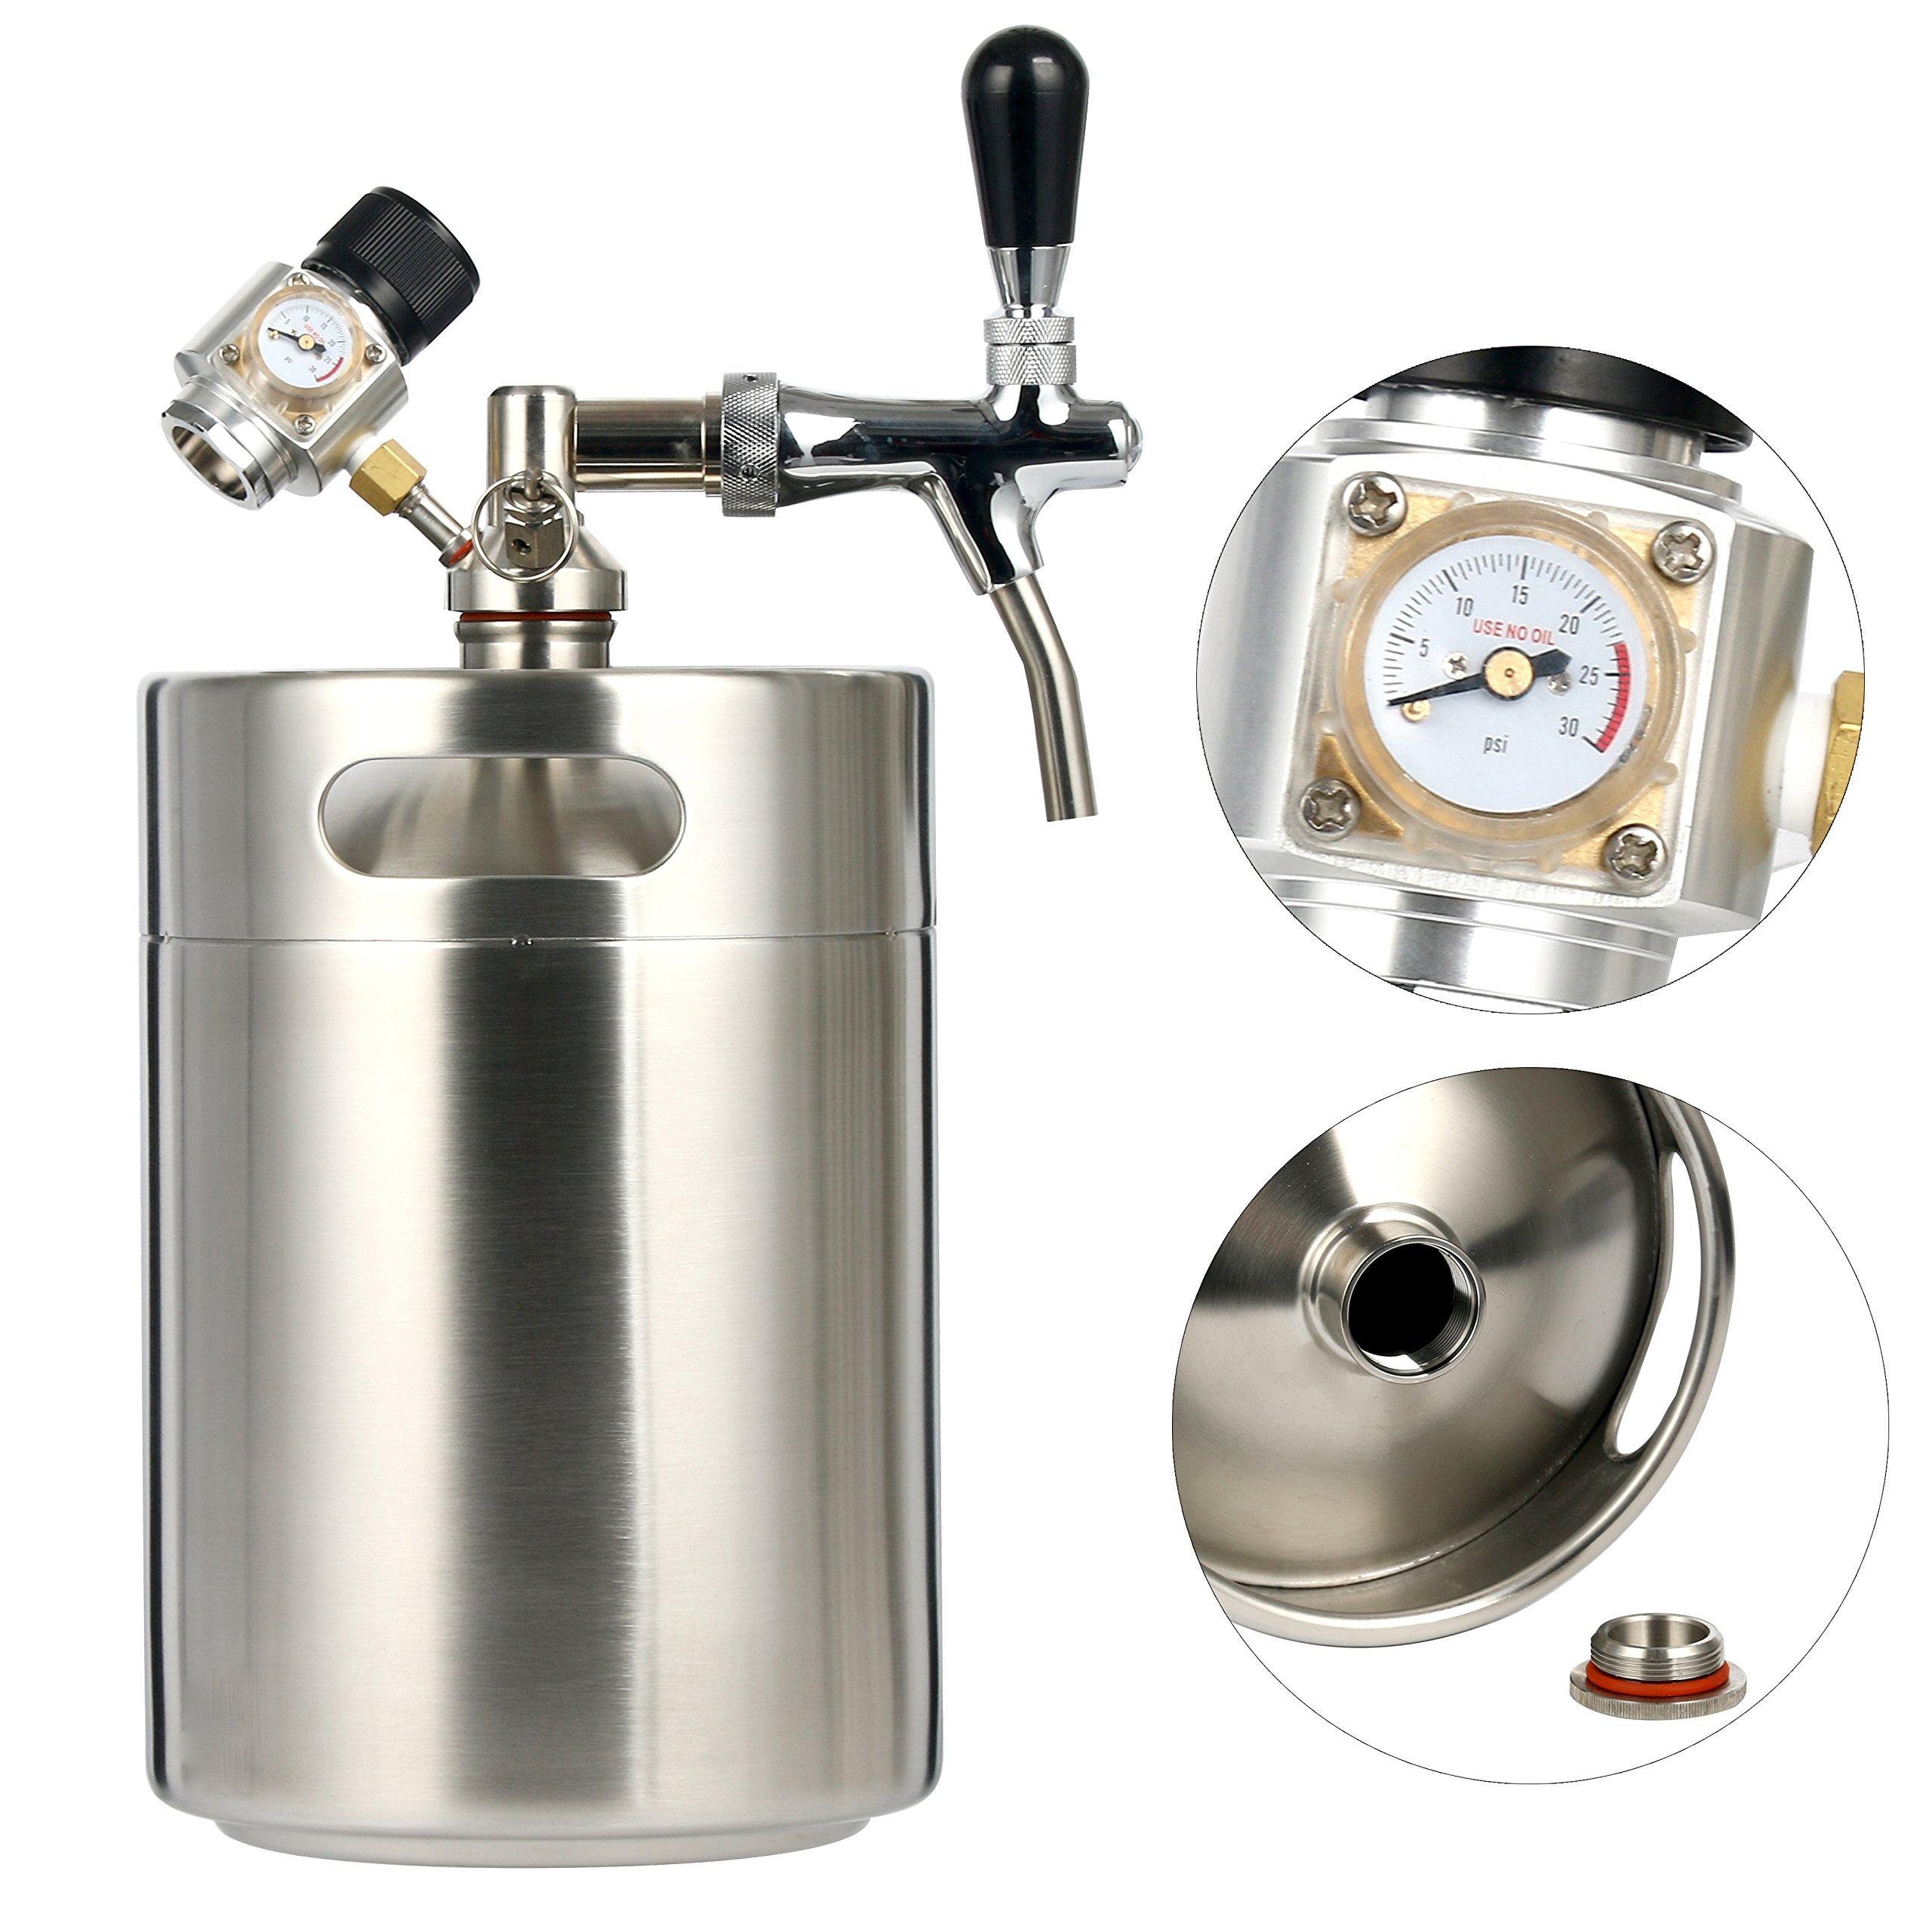 YaeBrew Mini CO2 Regulator and 5L 170 oz Stainless Steel Keg System Kit Home Brew Kegerator Beer Dispensor …